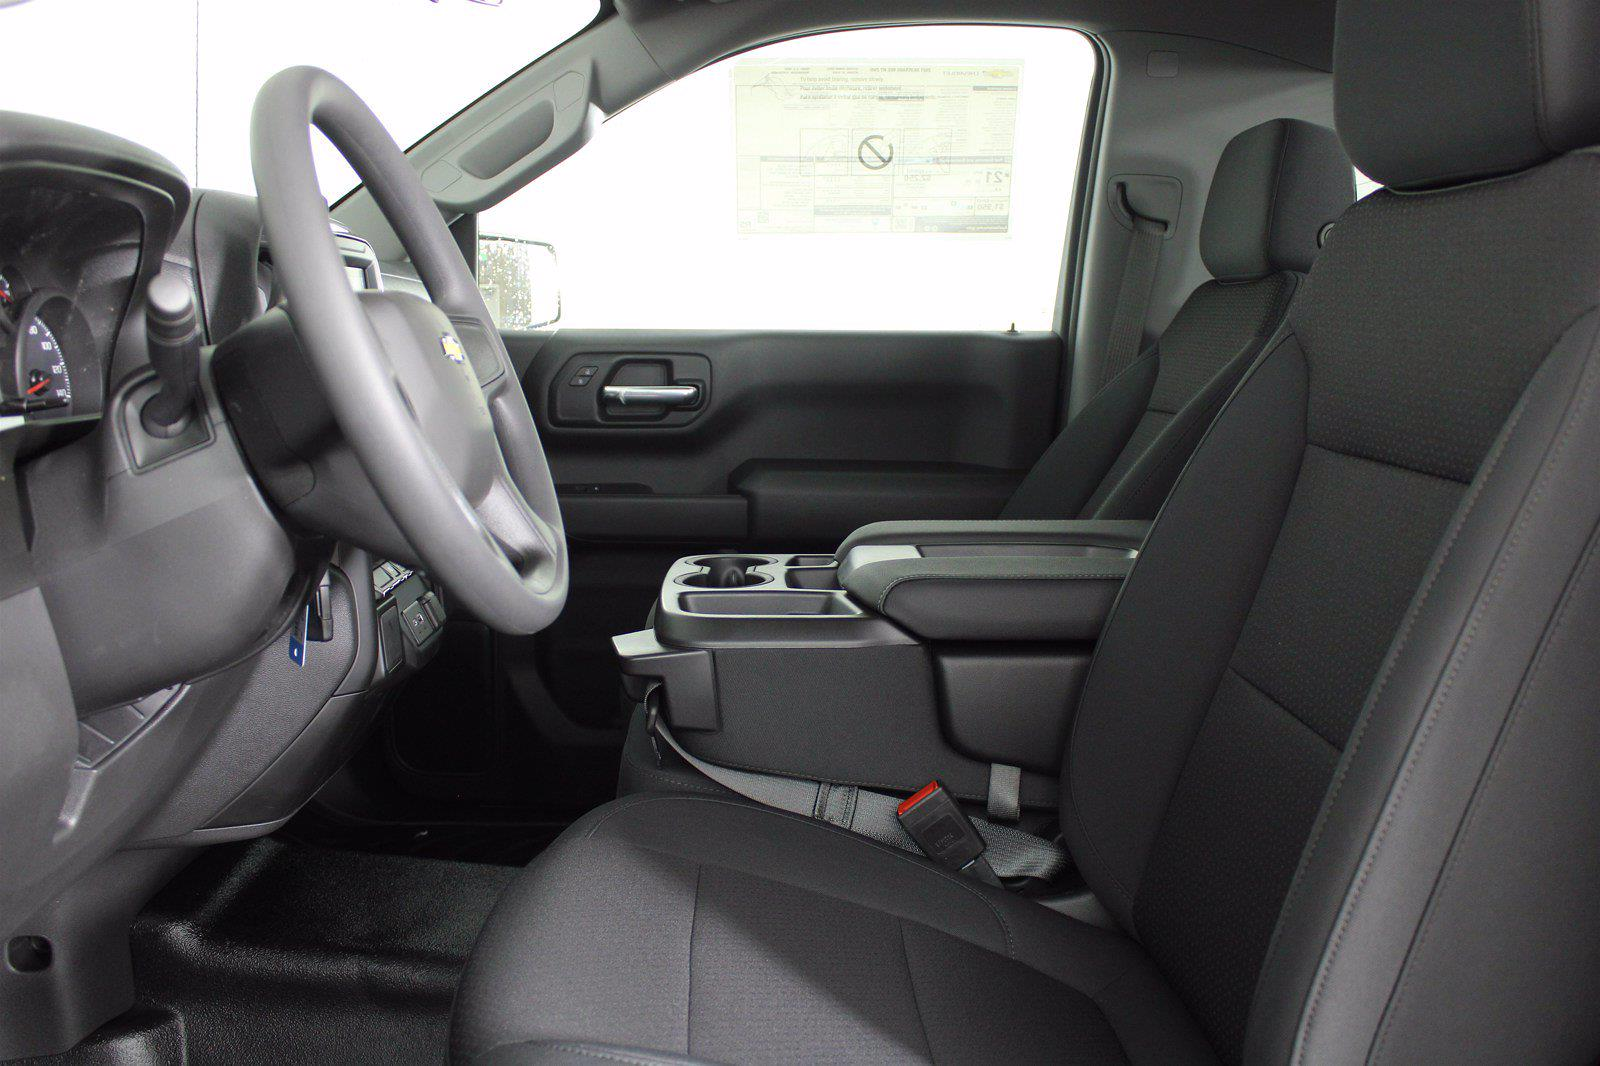 2021 Chevrolet Silverado 1500 Regular Cab 4x2, Pickup #D110918 - photo 14